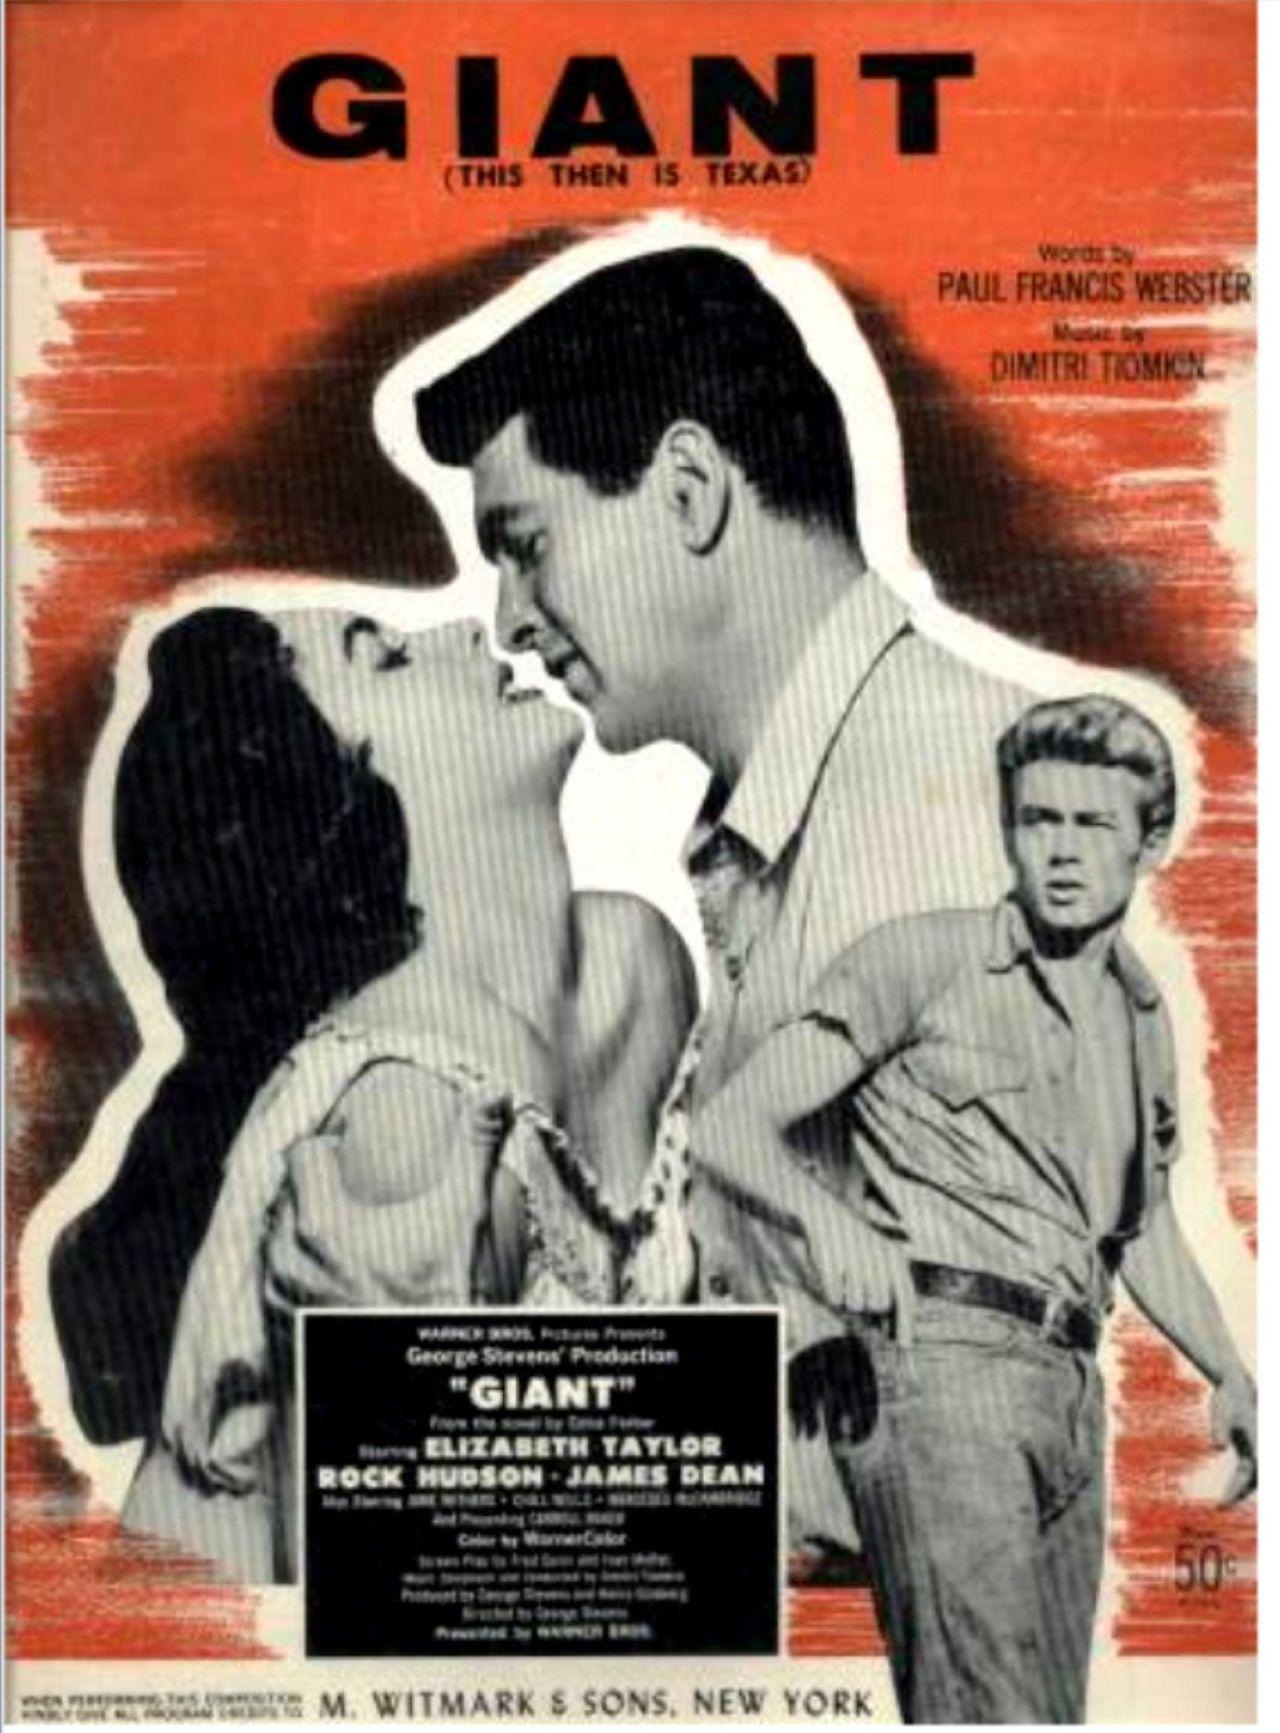 jackstune�giant� movie sheet music 1956 elizabeth